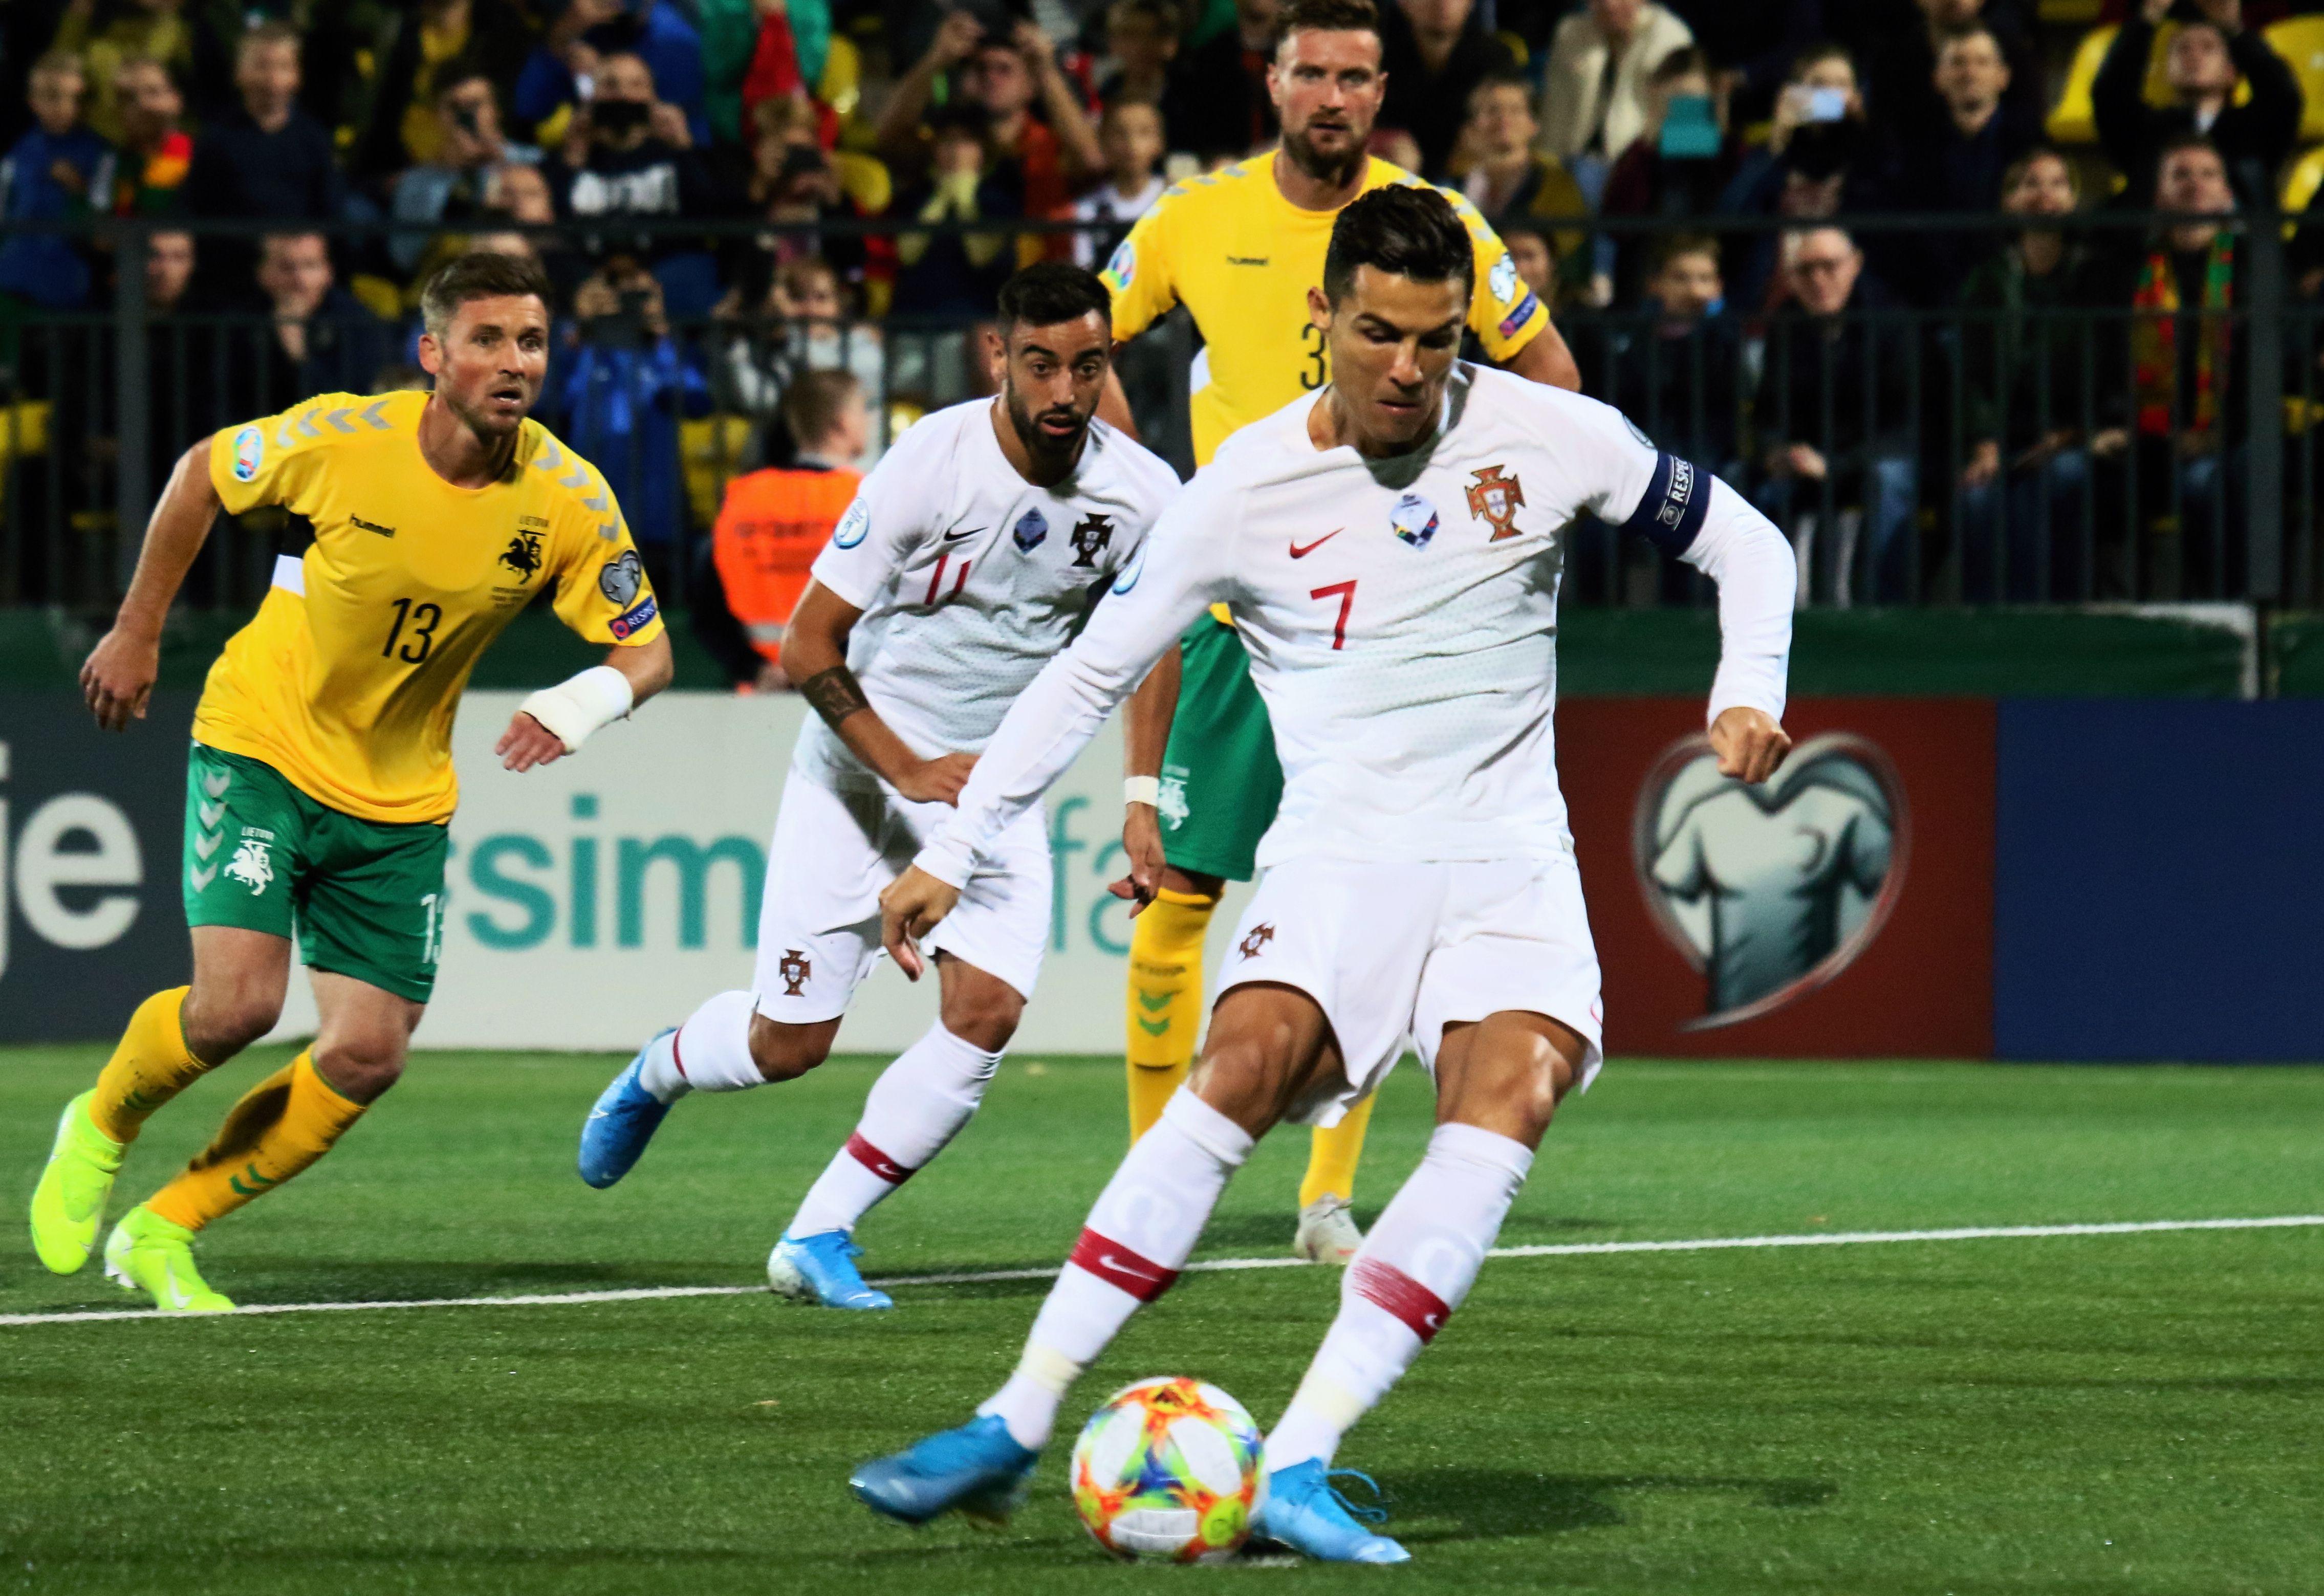 Football - Euro 2020 - Lituanie - Portugal : le quadruplé de Cristiano Ronaldo en vidéo